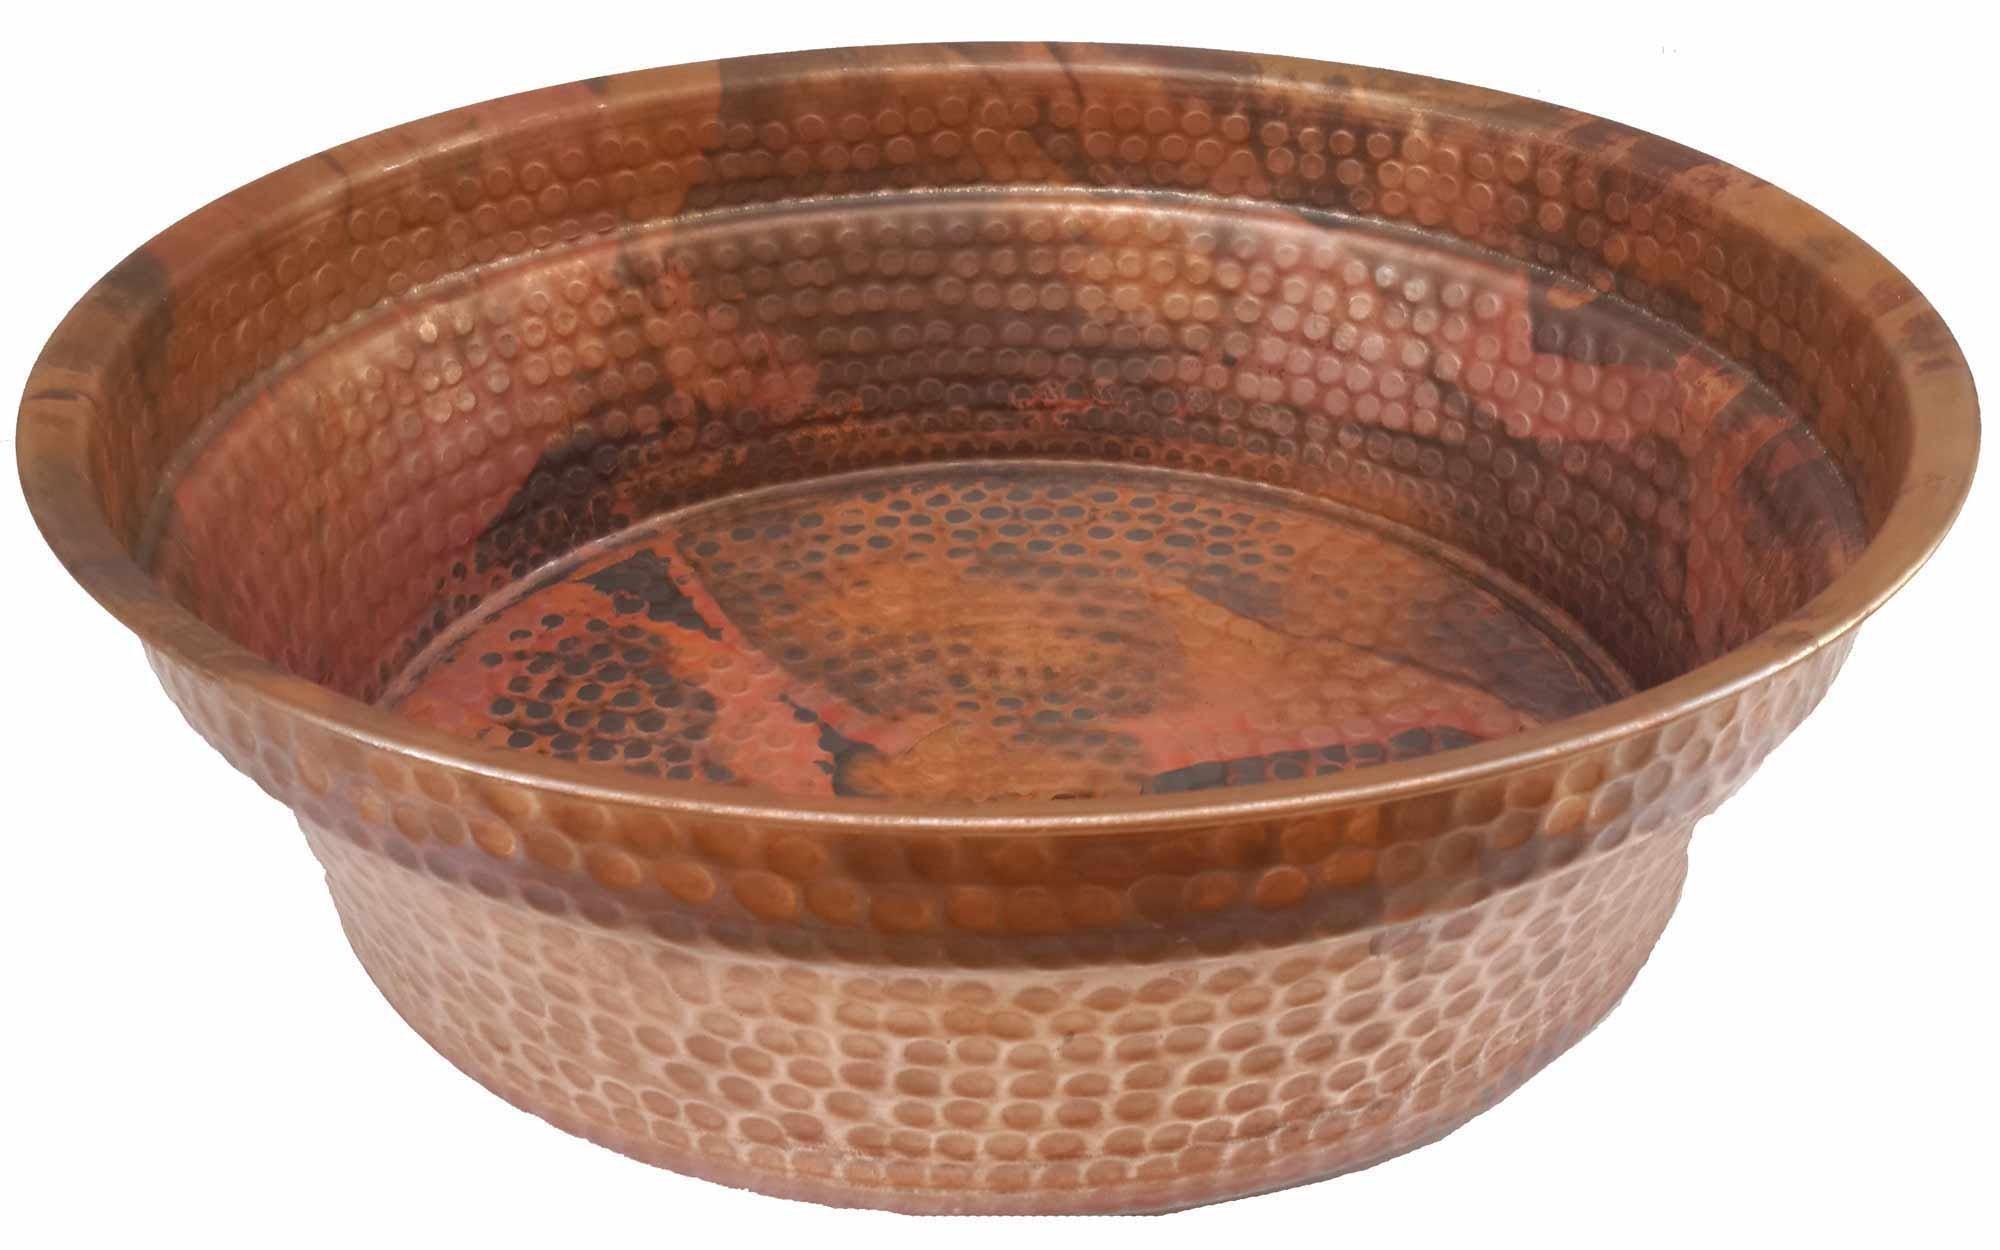 Egypt gift shops Copper Foot Rub Soak Wash Spa Styling Salon Massage Pedicure Bowls Healthy Wash Pot Garden Planter Water Storage Skin Dehydration